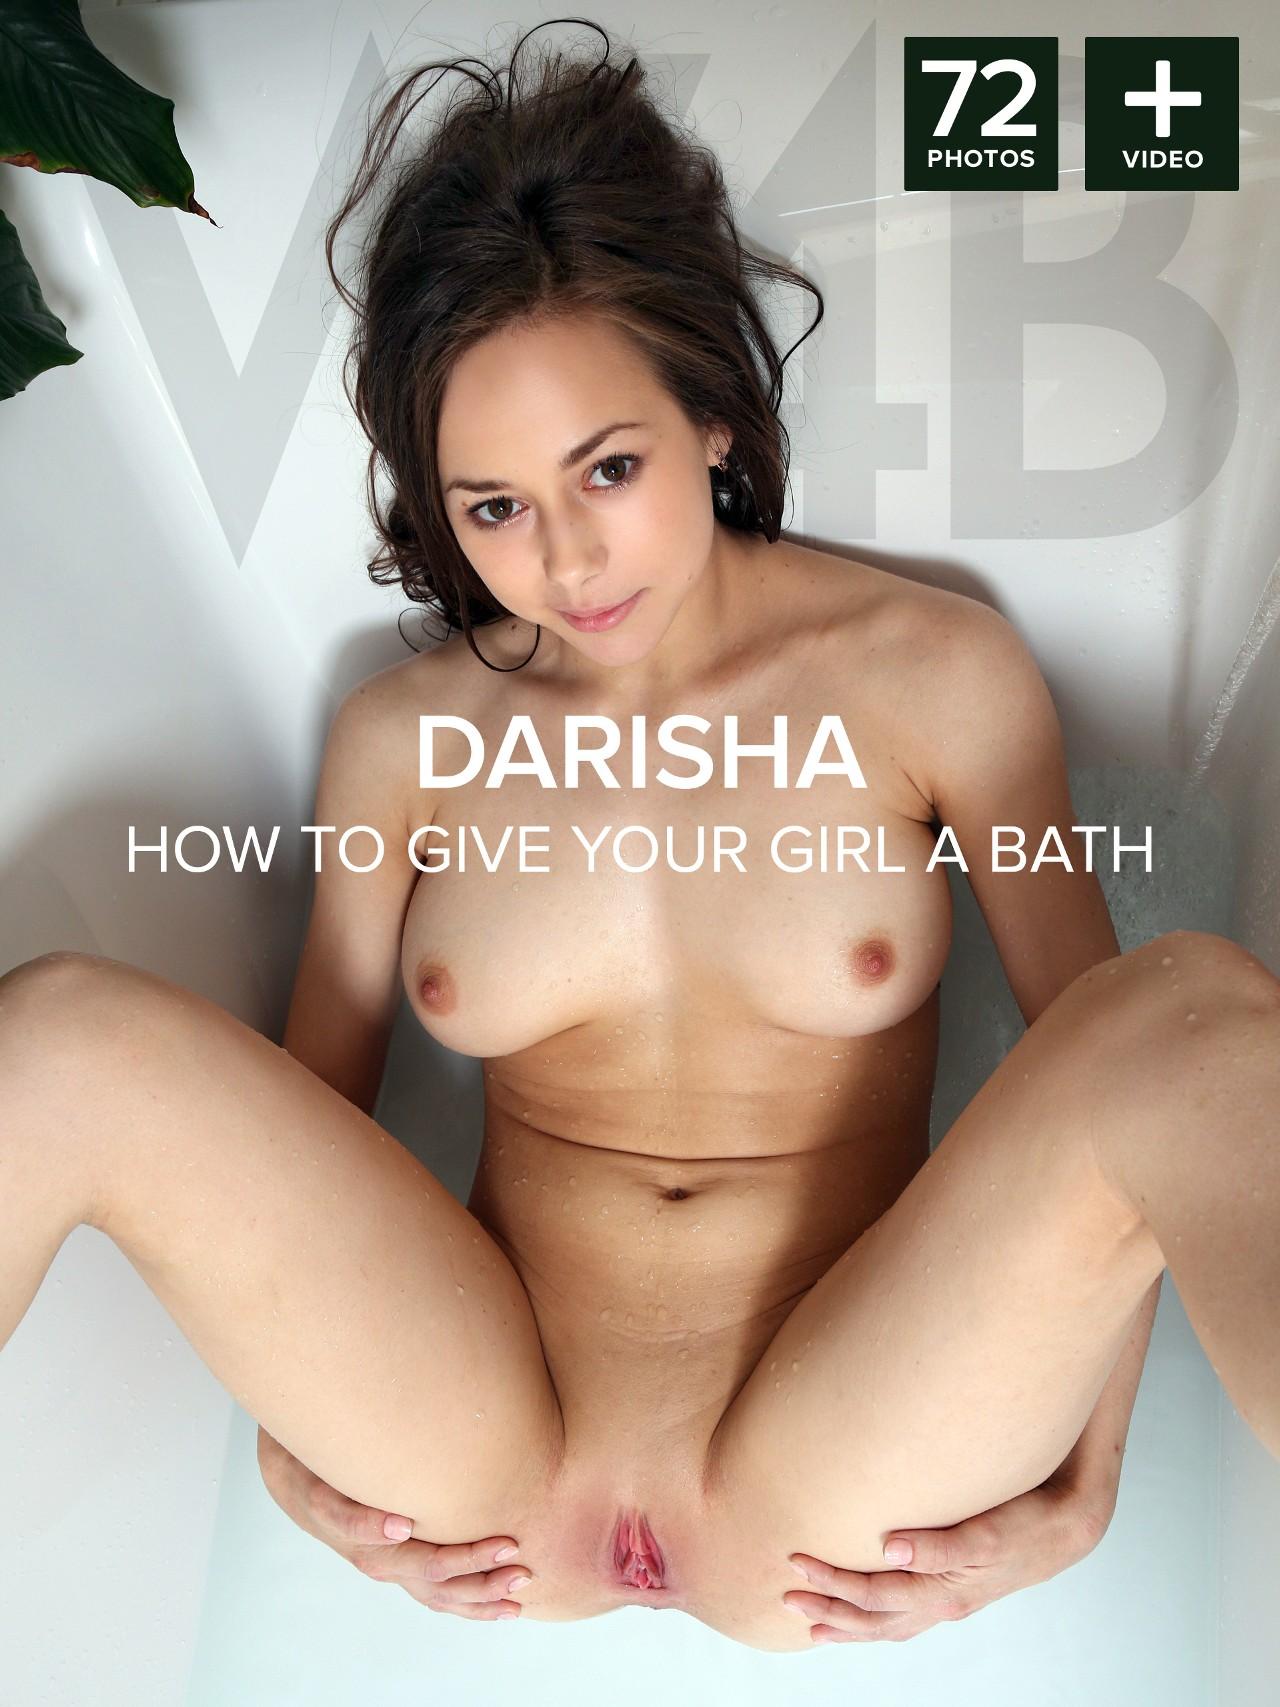 Darisha: How to give your girl a bath